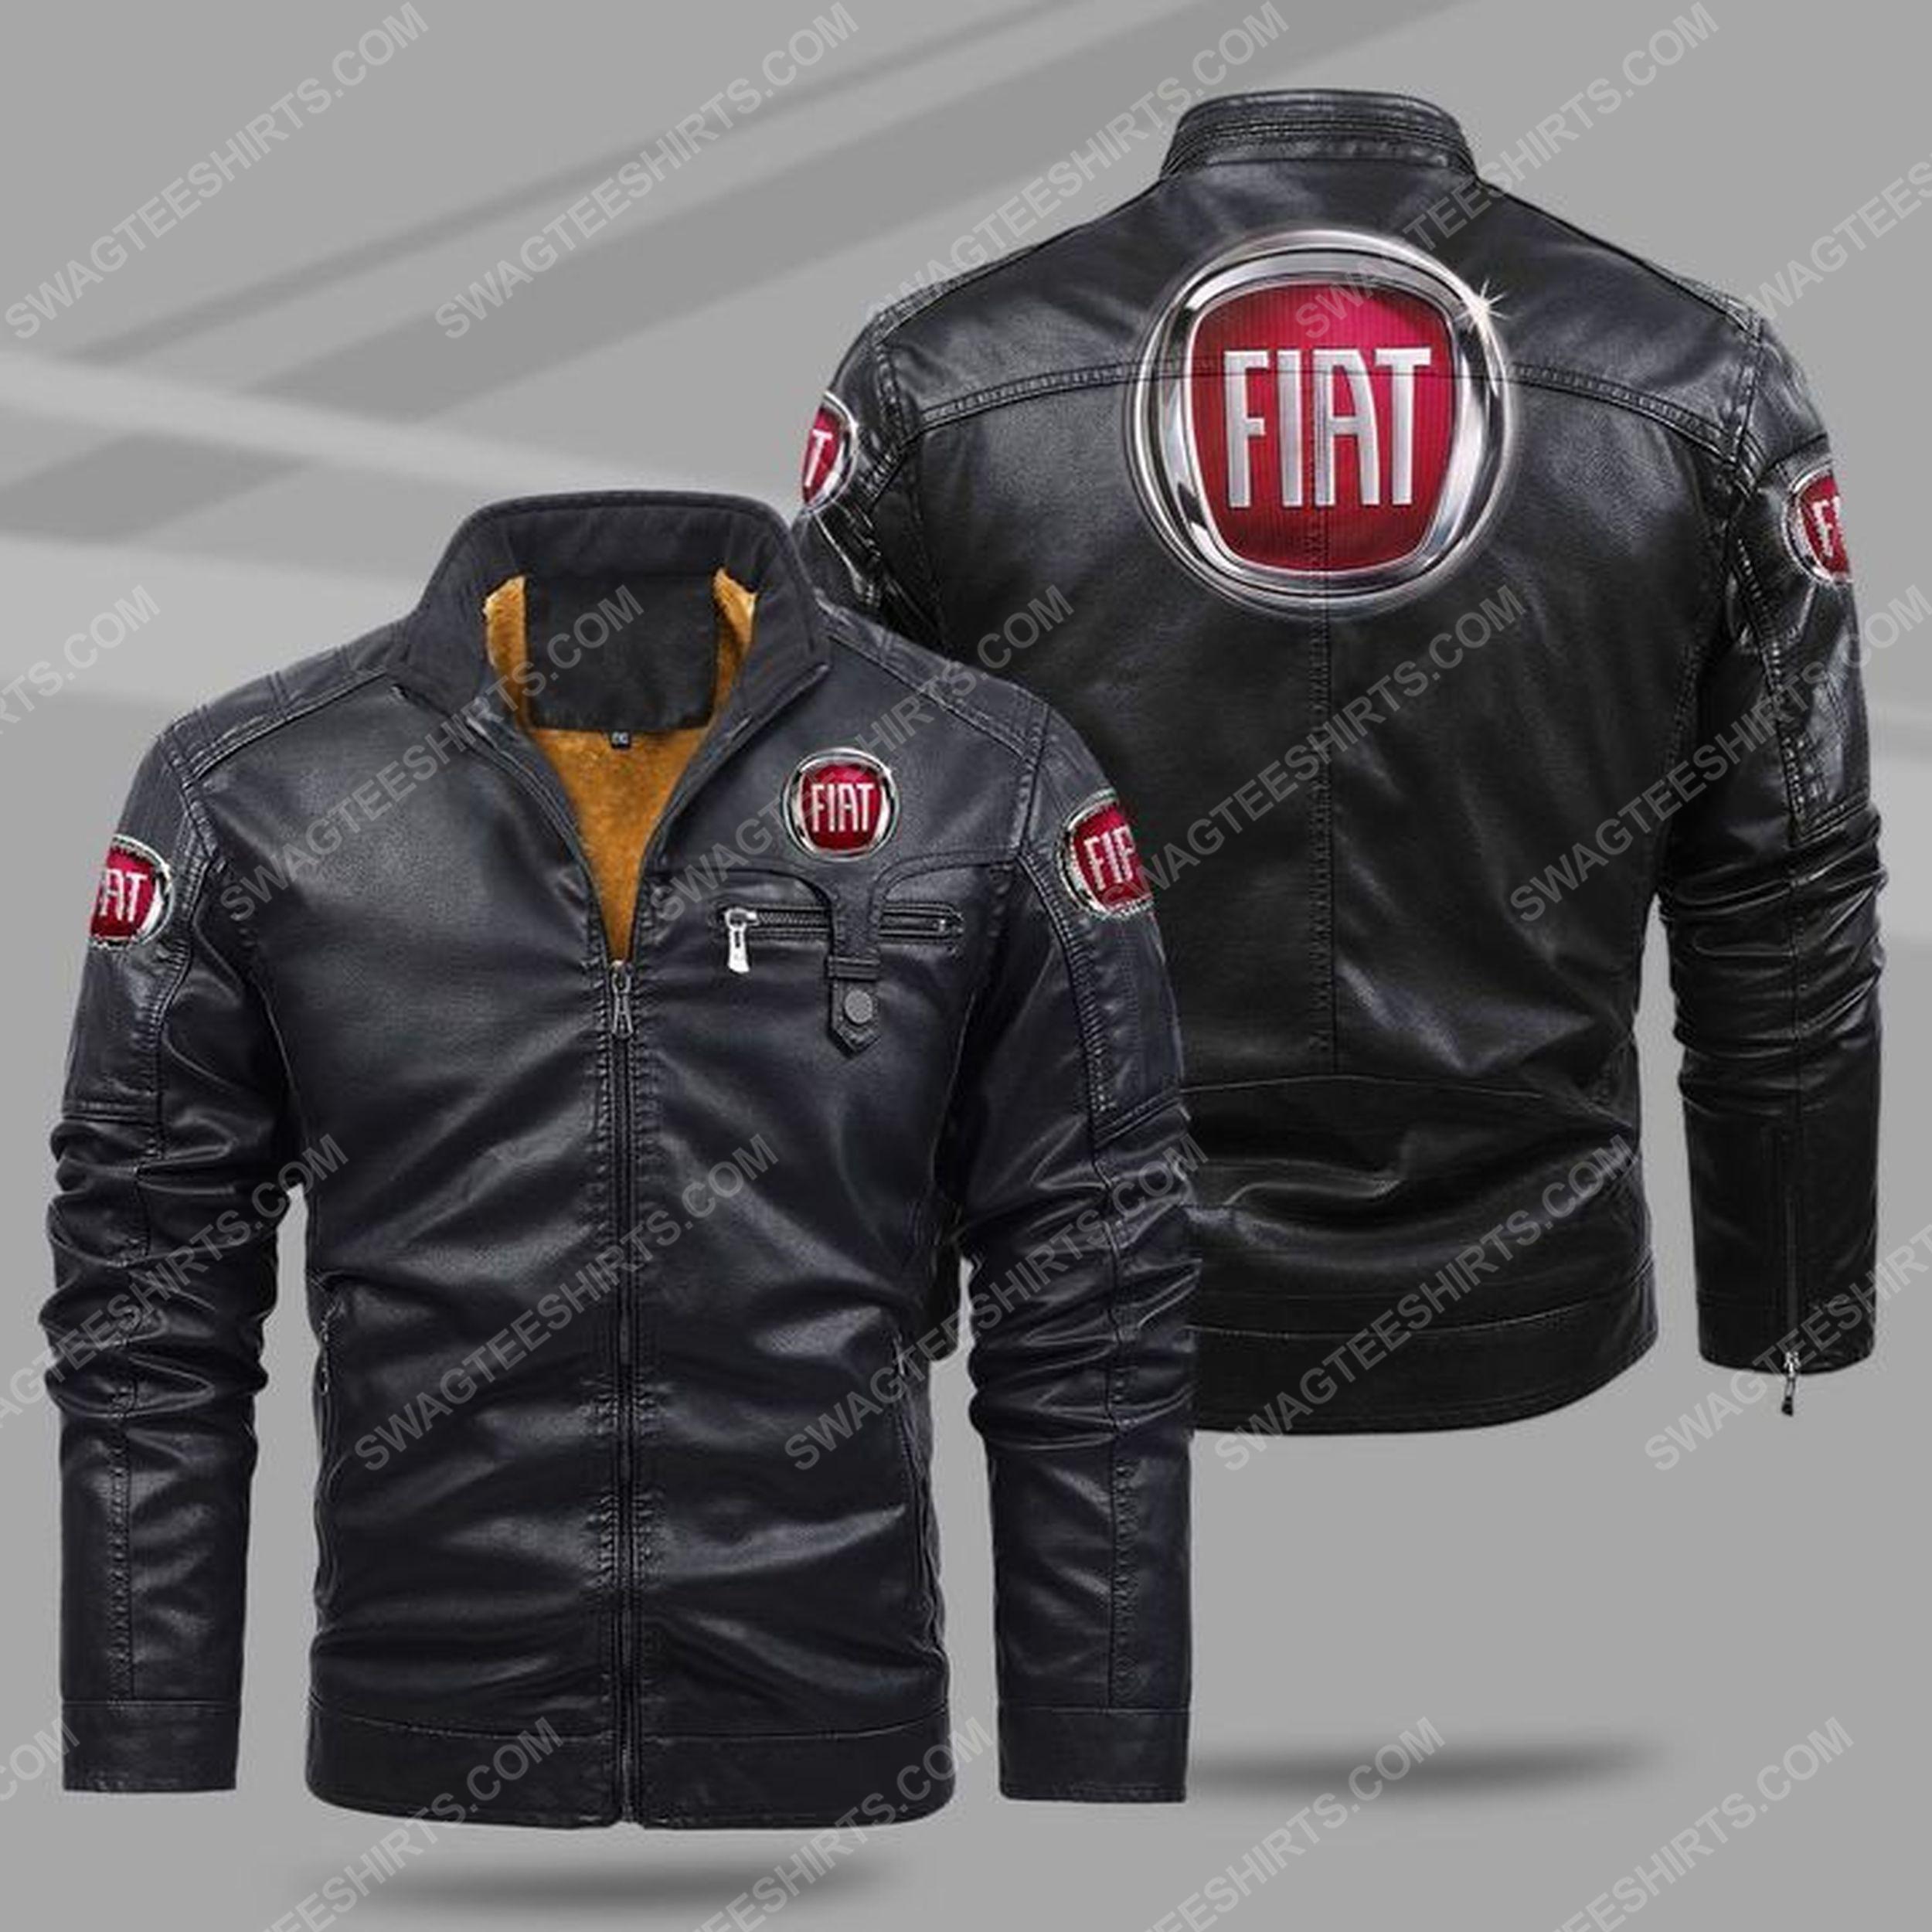 The fiat car all over print fleece leather jacket - black 1 - Copy